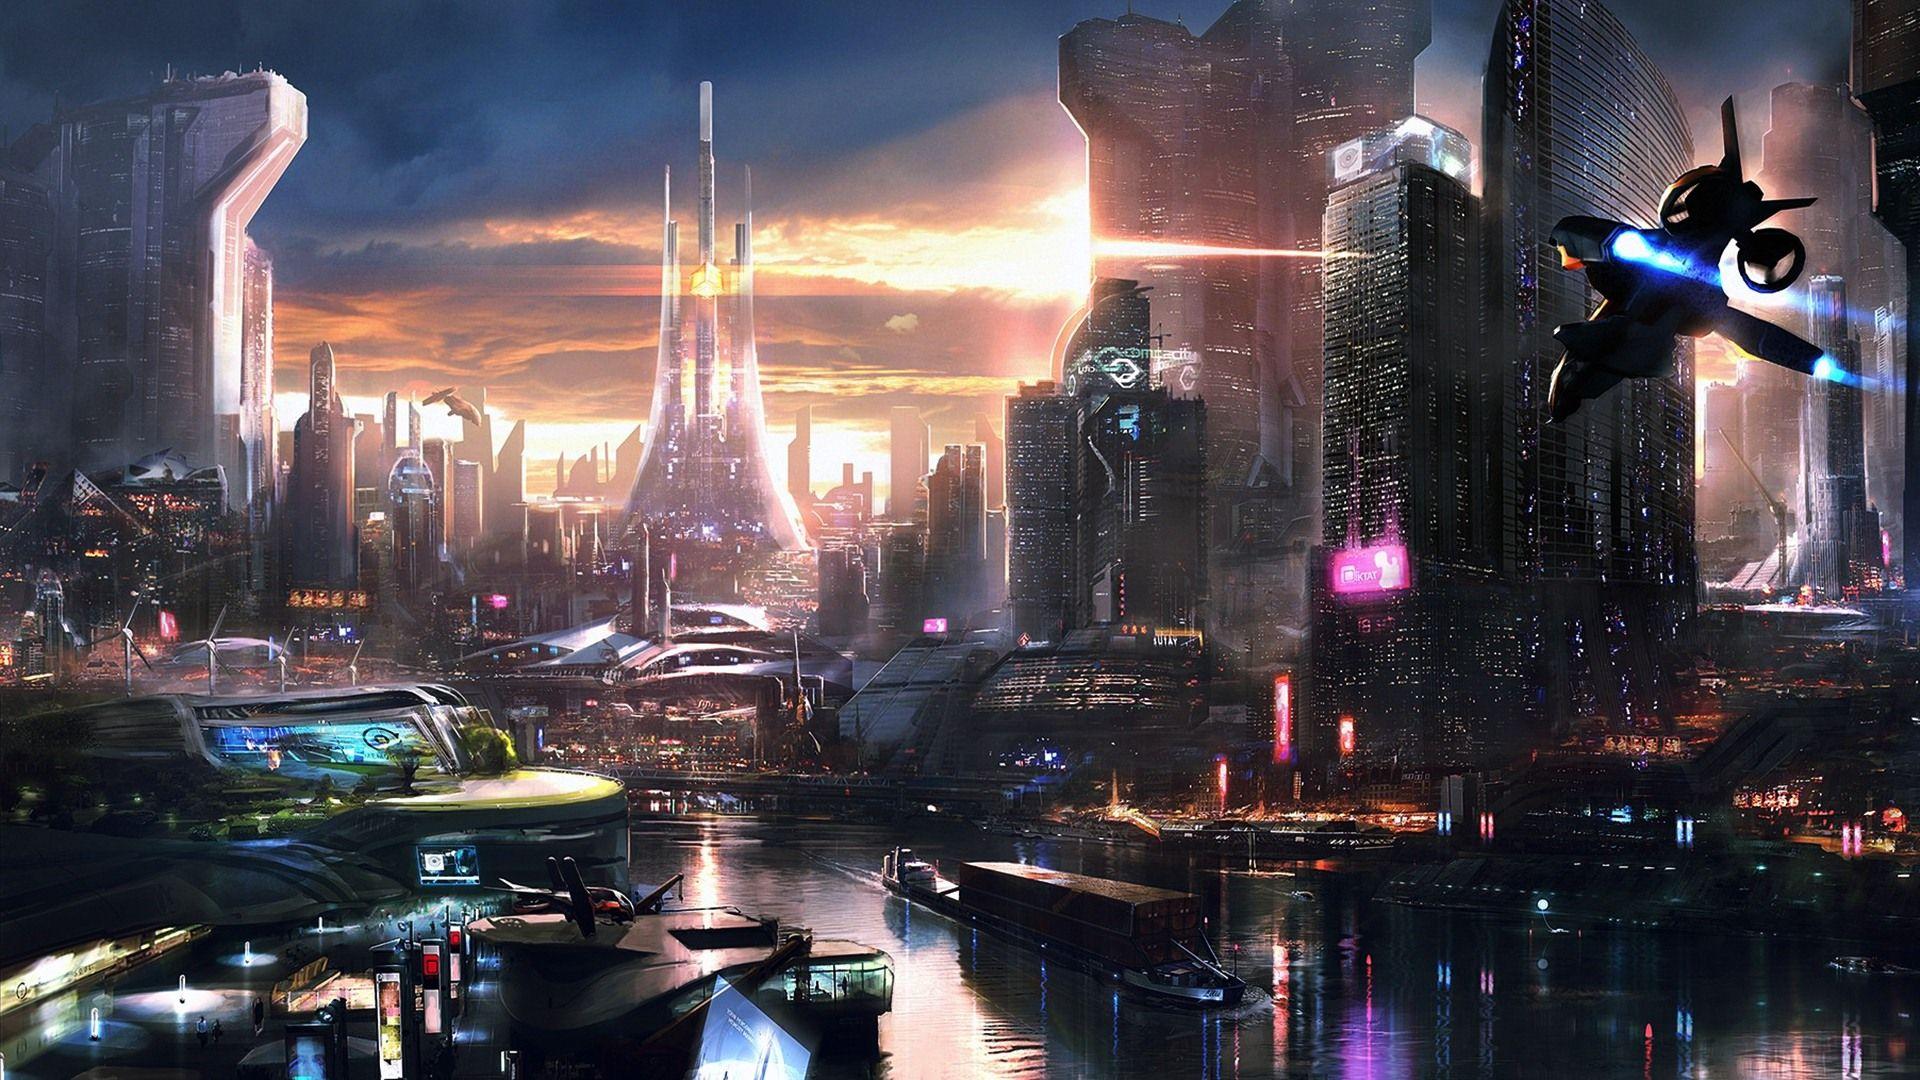 Download Free Cyberpunk Backgrounds Futuristische Stadt Sci Fi Stadt Cyberpunk City